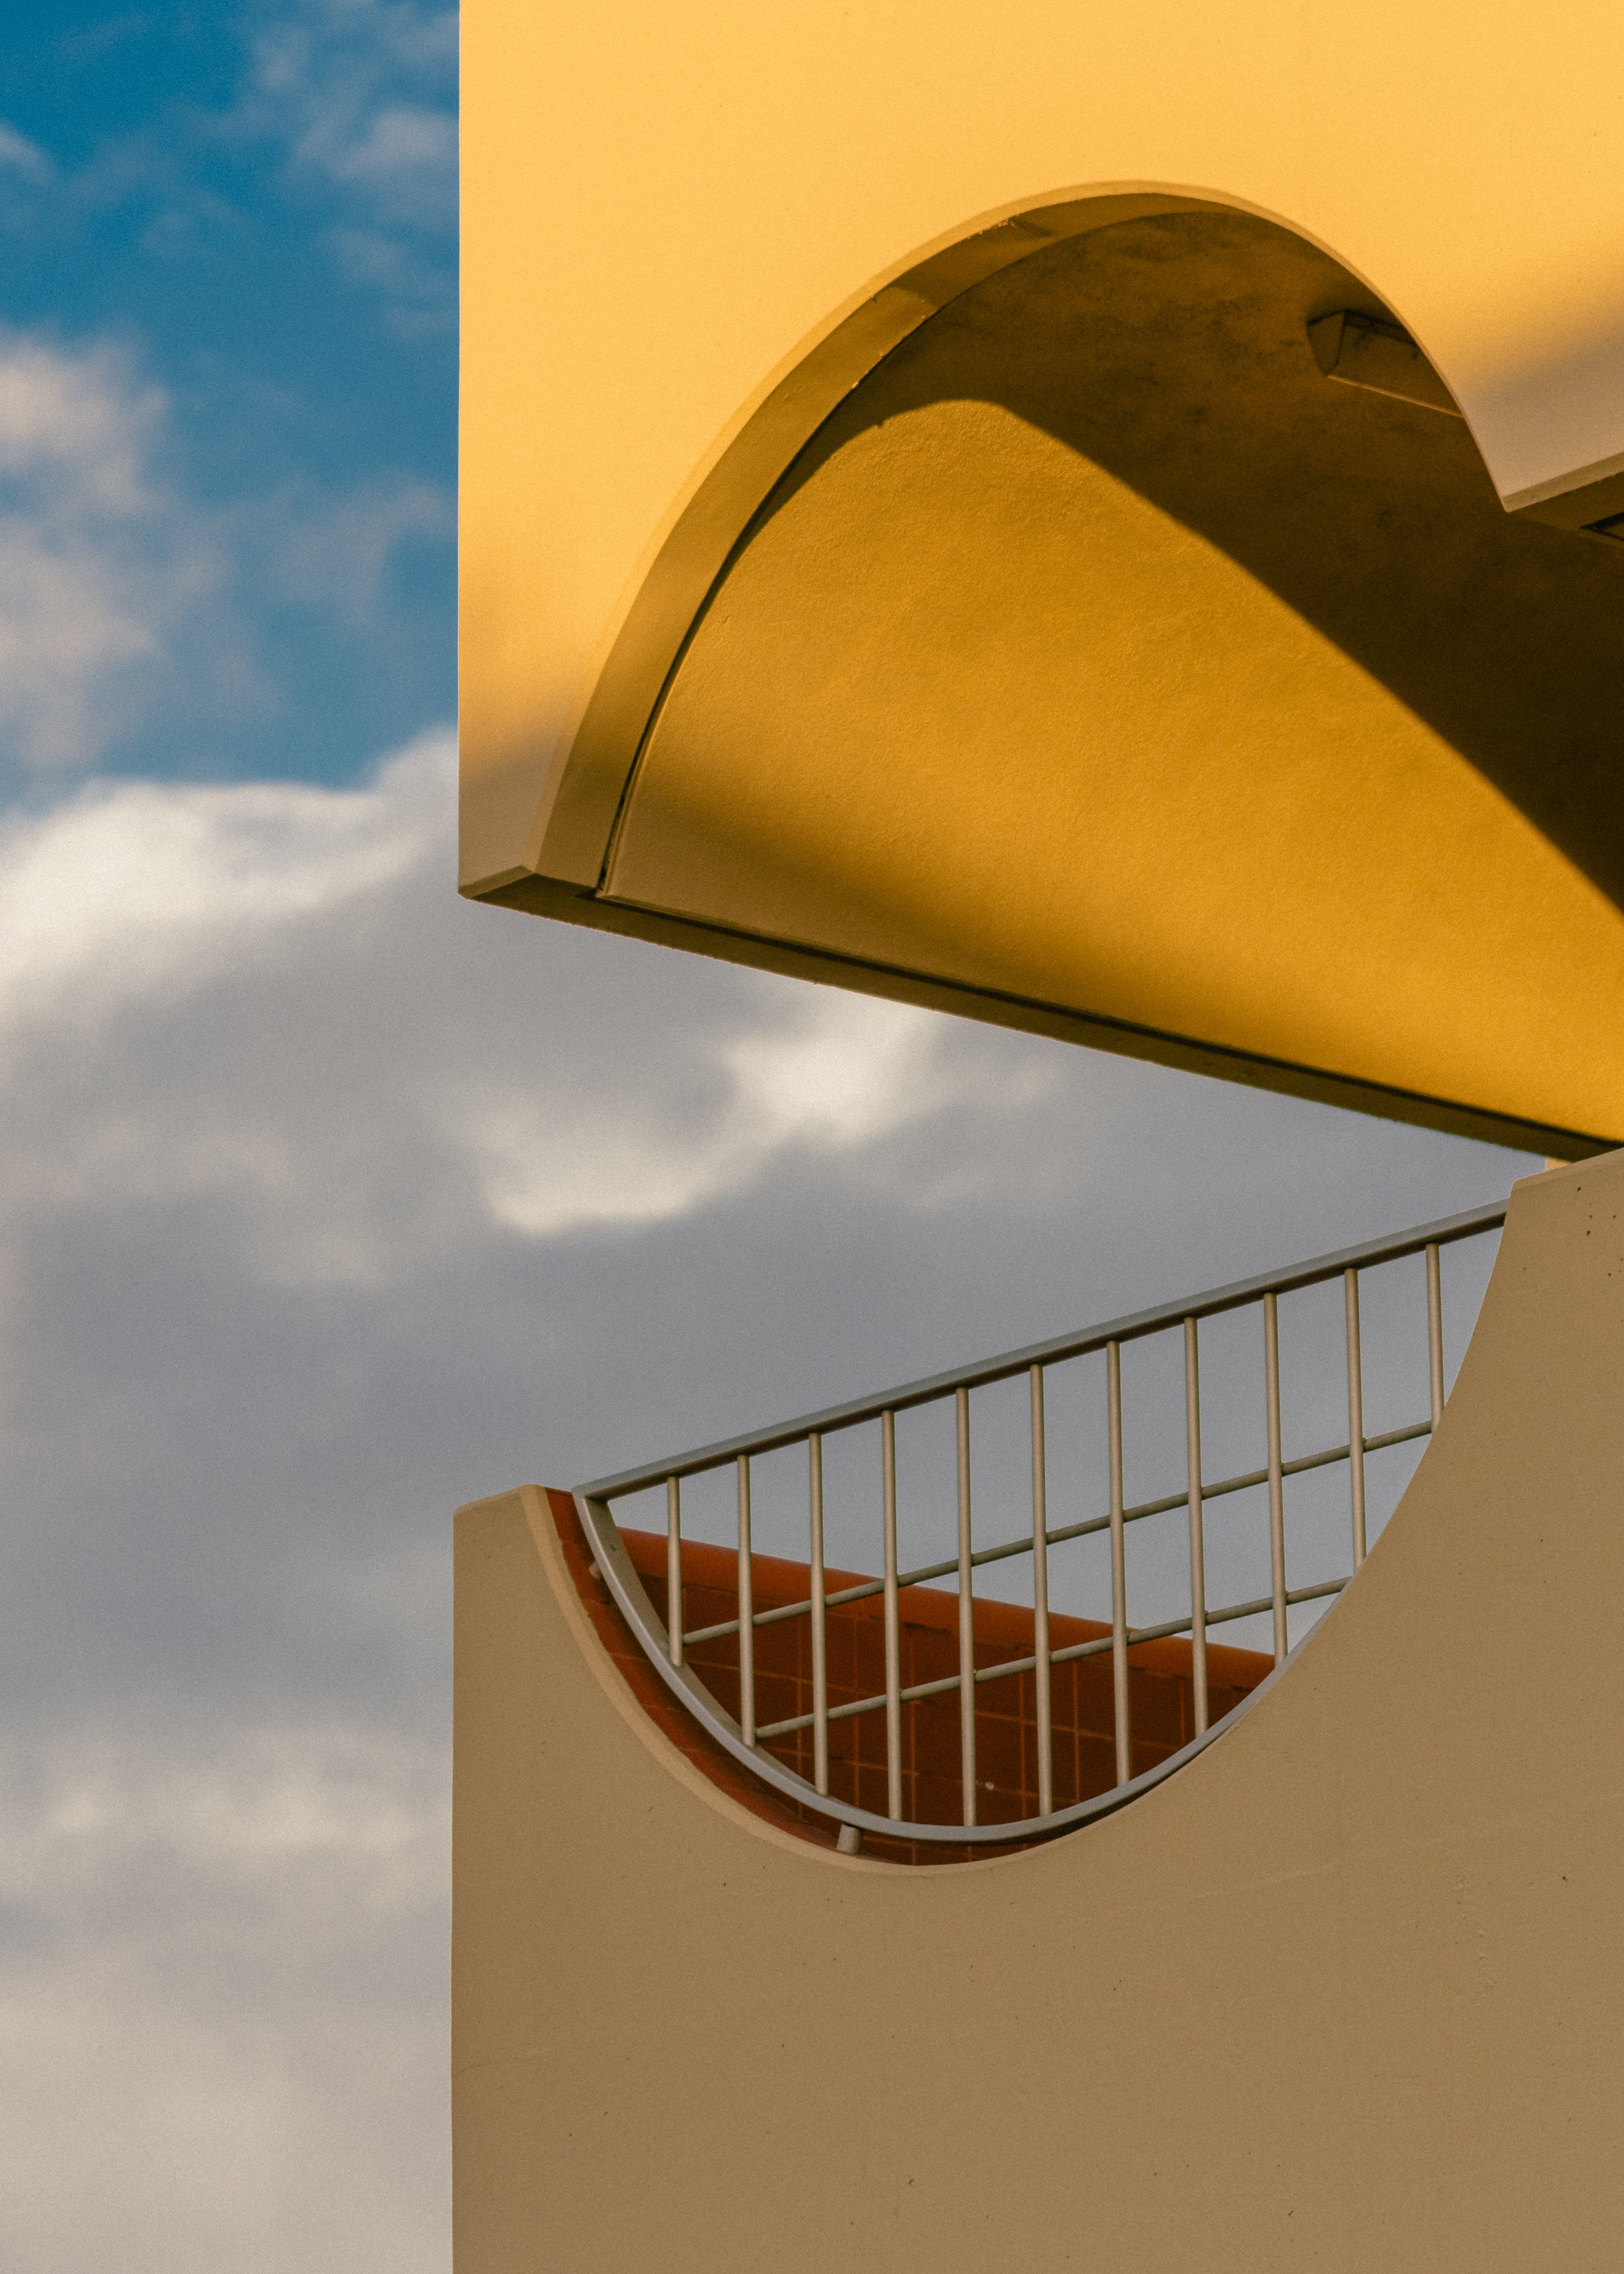 ROBERTO SERRATO | PHOTOGRAPHER - RIVERBANK, CA